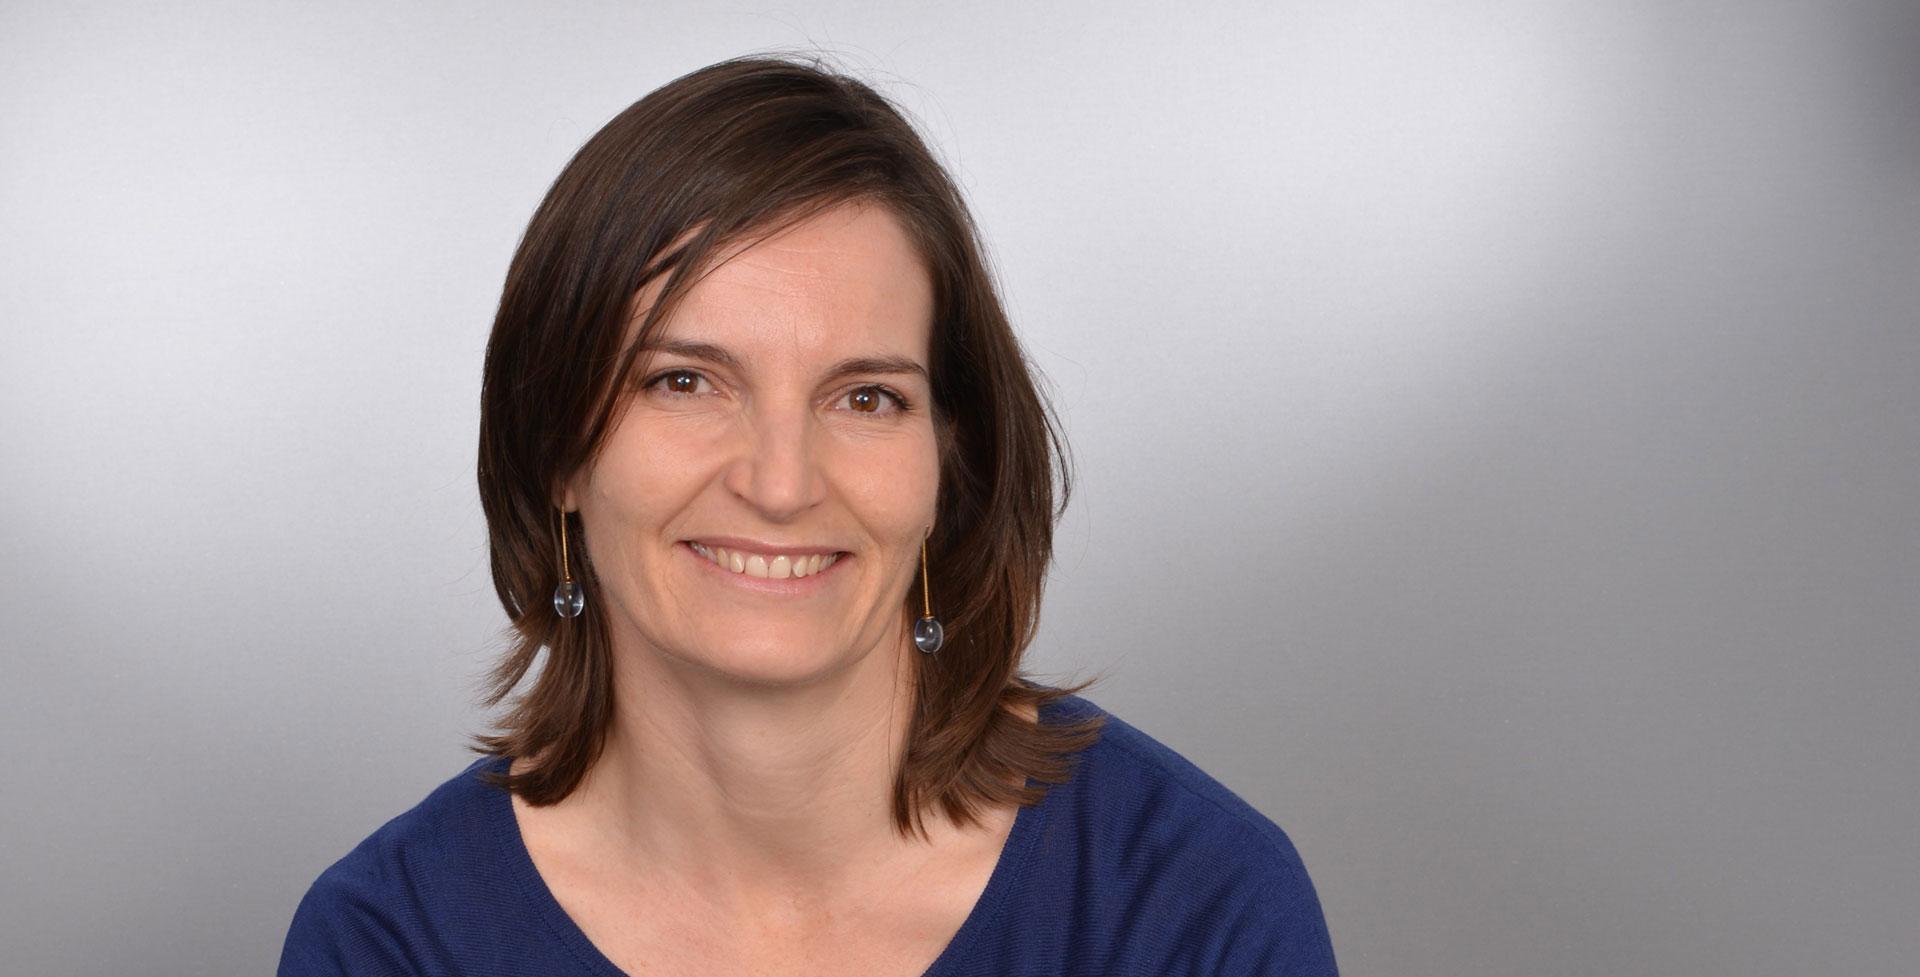 Sophrologue à Boulogne-Billancourt - Catherine Auguste